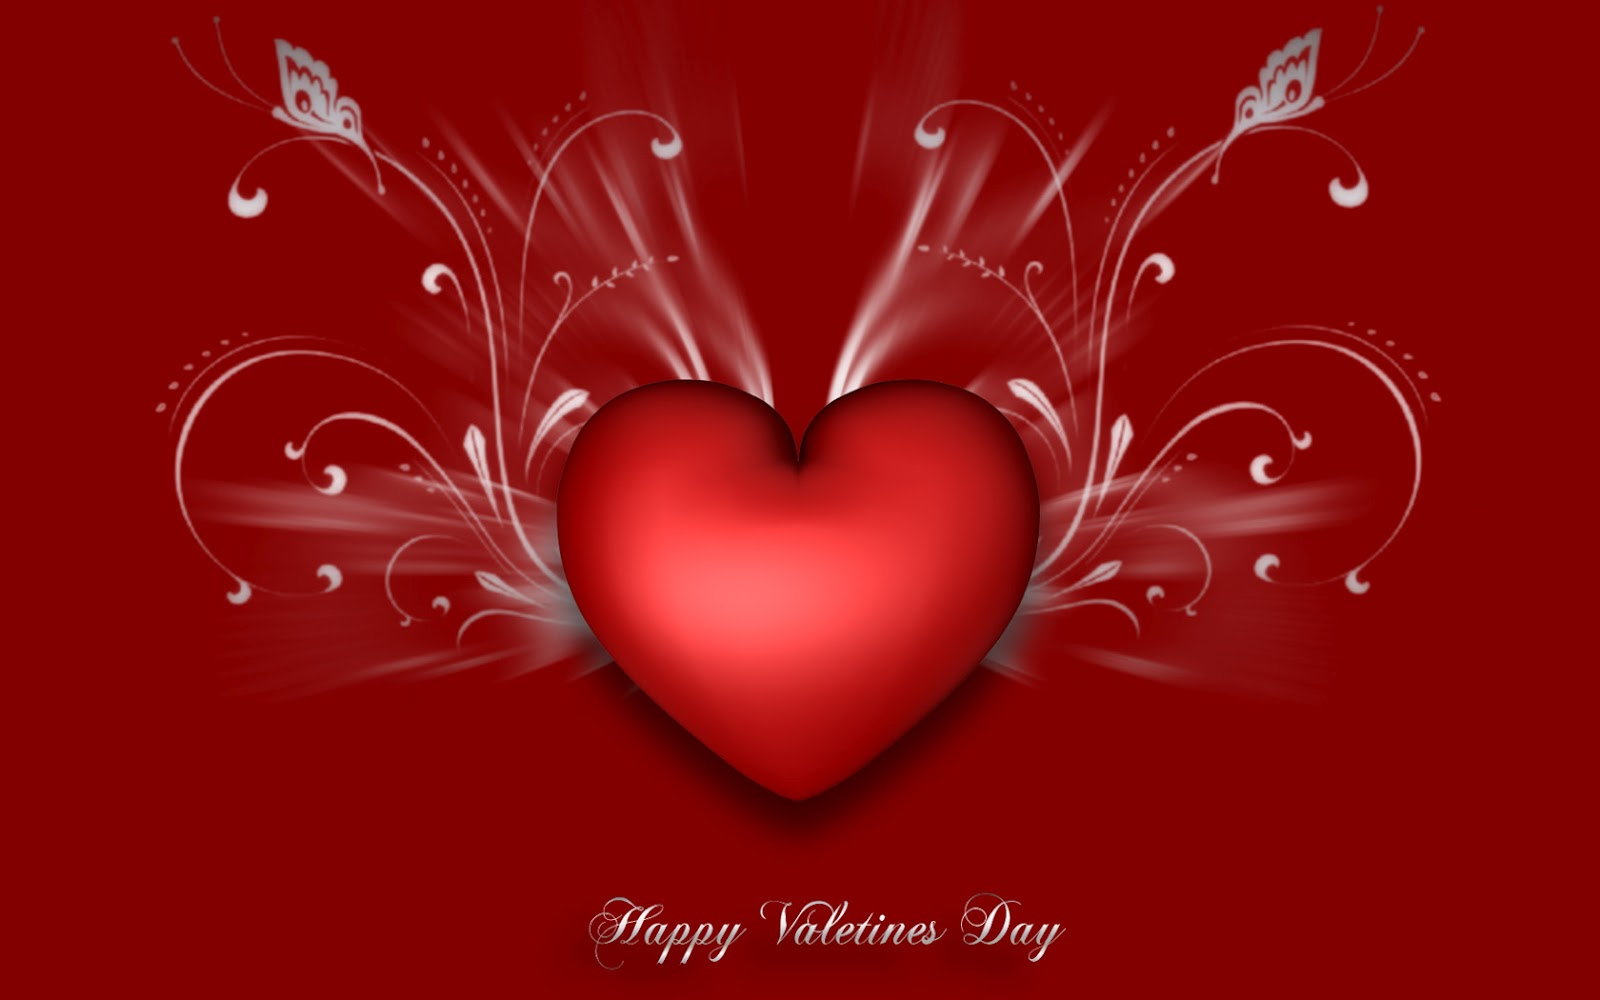 http://3.bp.blogspot.com/-Foi_P7NlA_g/TzigwxUm0oI/AAAAAAAADAk/pX7nX_nypBk/s1600/happy_valentines_day.jpg